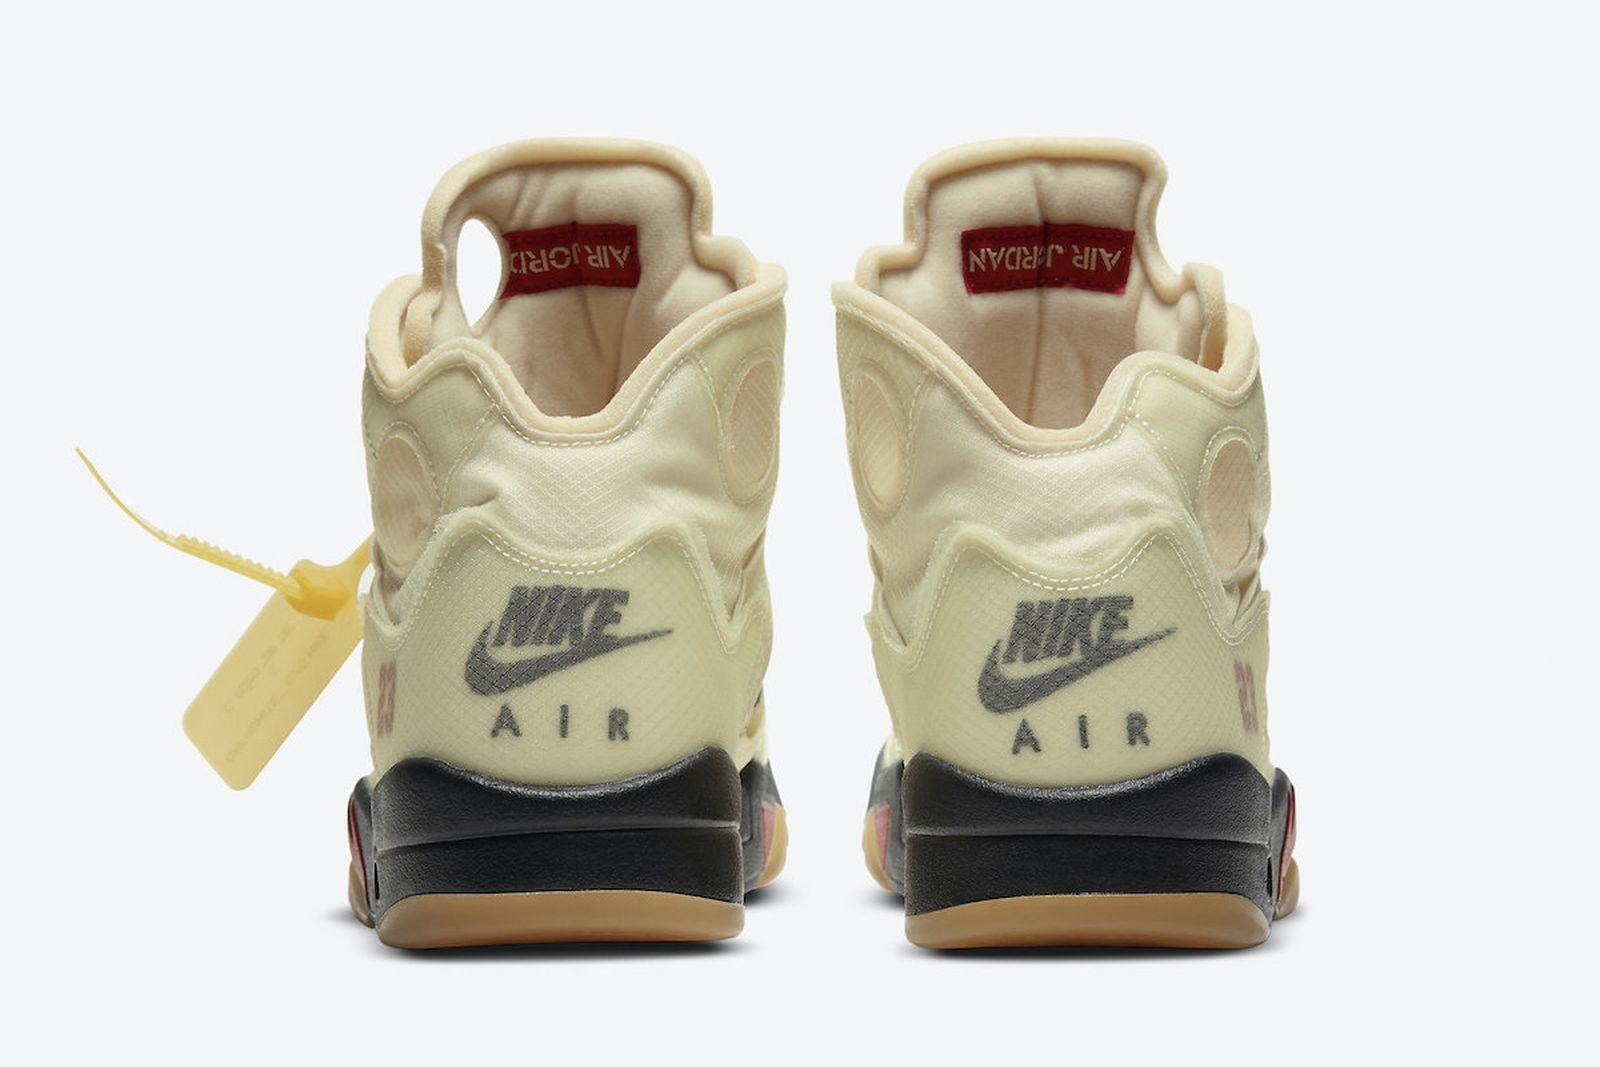 off-white-air-jordan-5-white-release-date-price-0-05